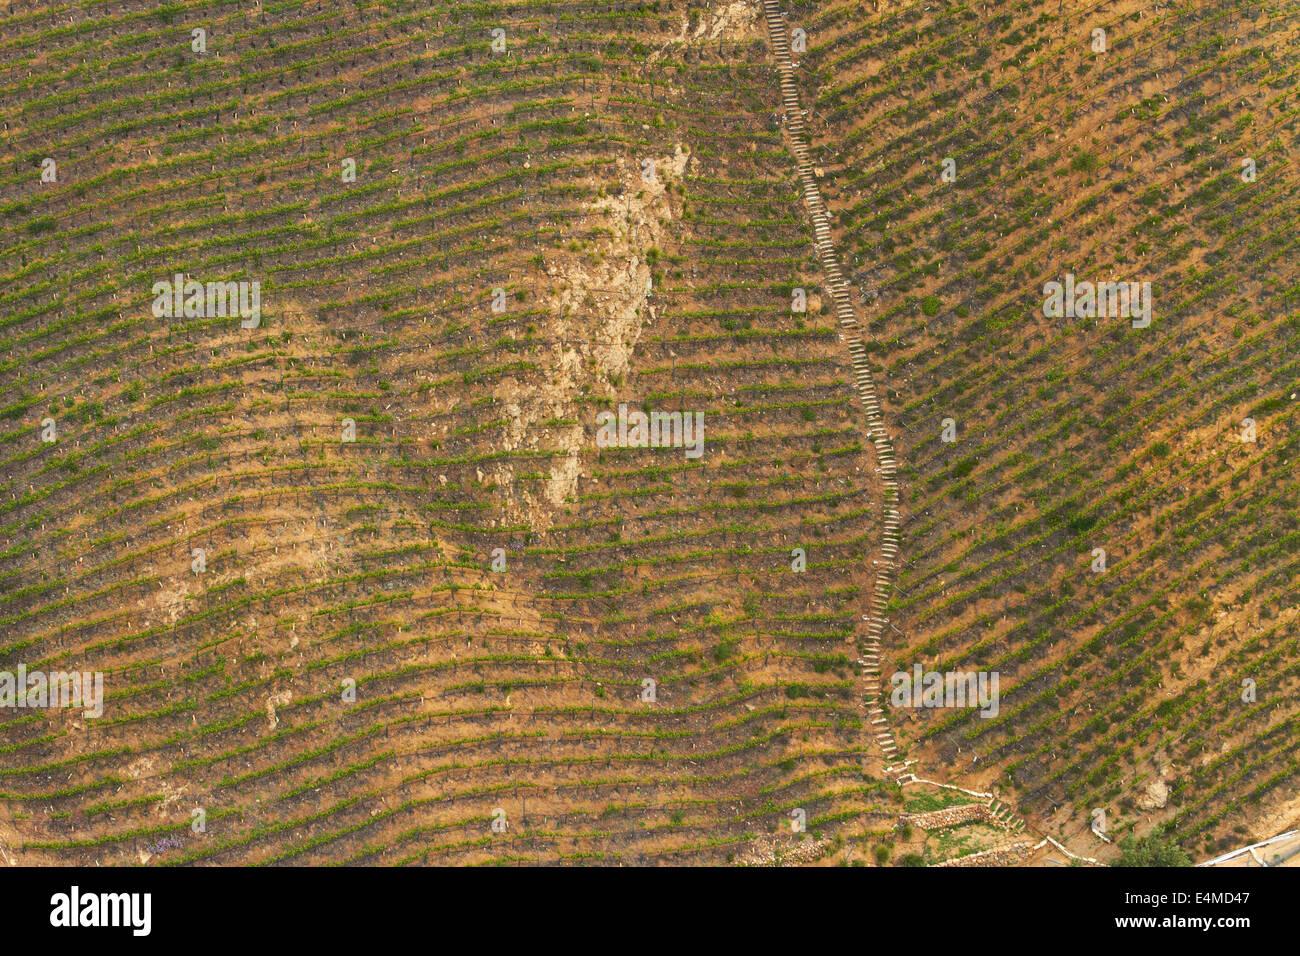 Hollywood Classic Vineyard, Hollywood Hills, Hollywood, Los Angeles, California, USA - aerial - Stock Image